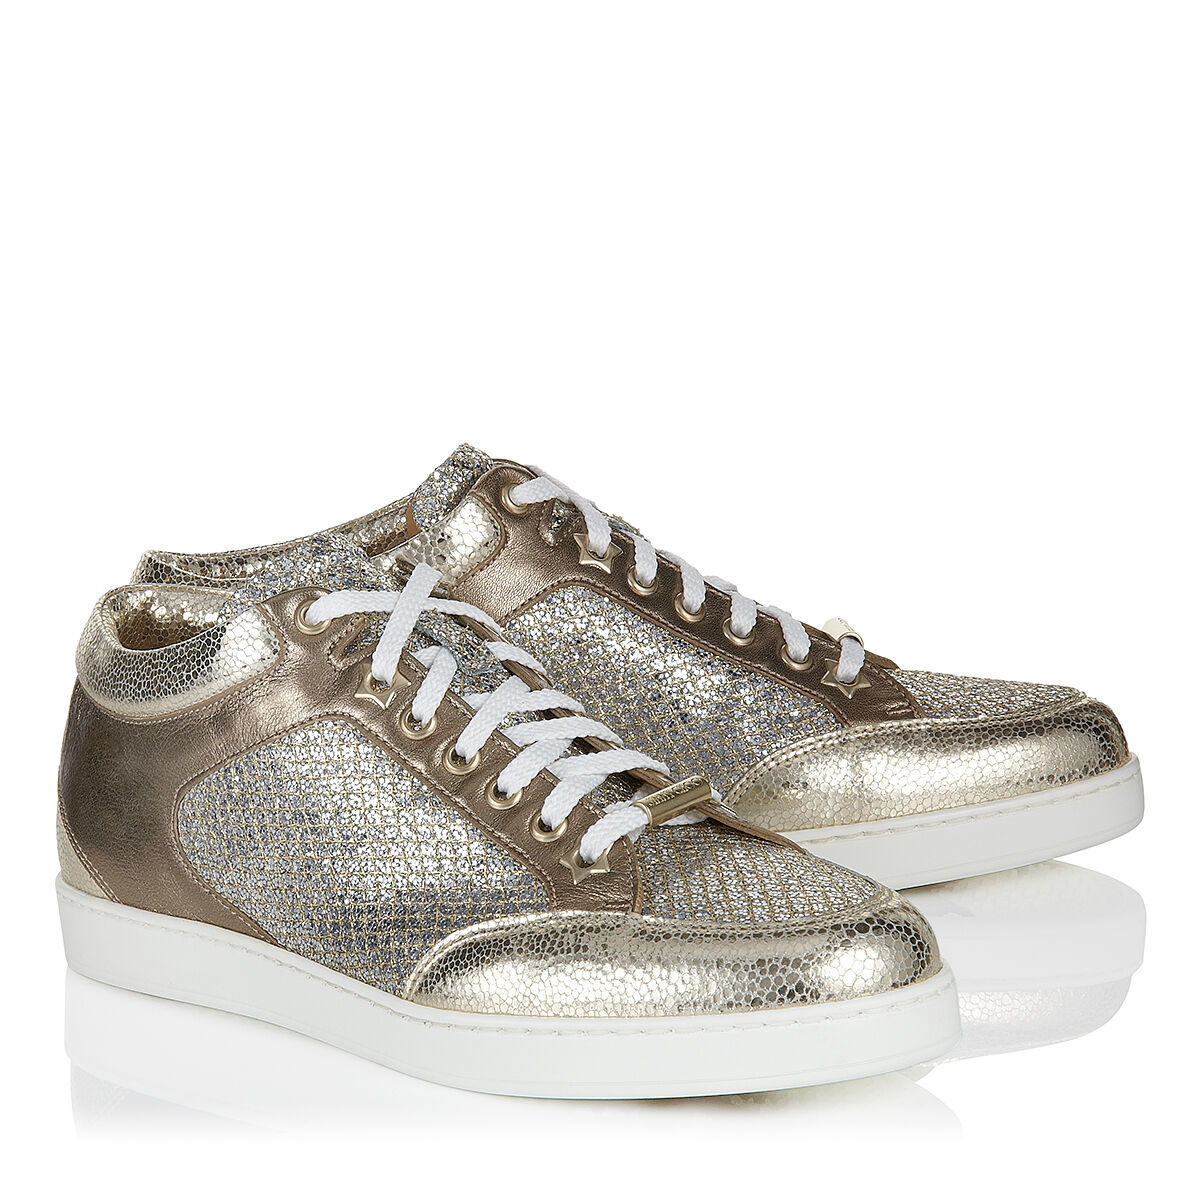 e072ff6b3b7 ... coupon for jimmy choo tokyo sneakers for women e0542 edd07